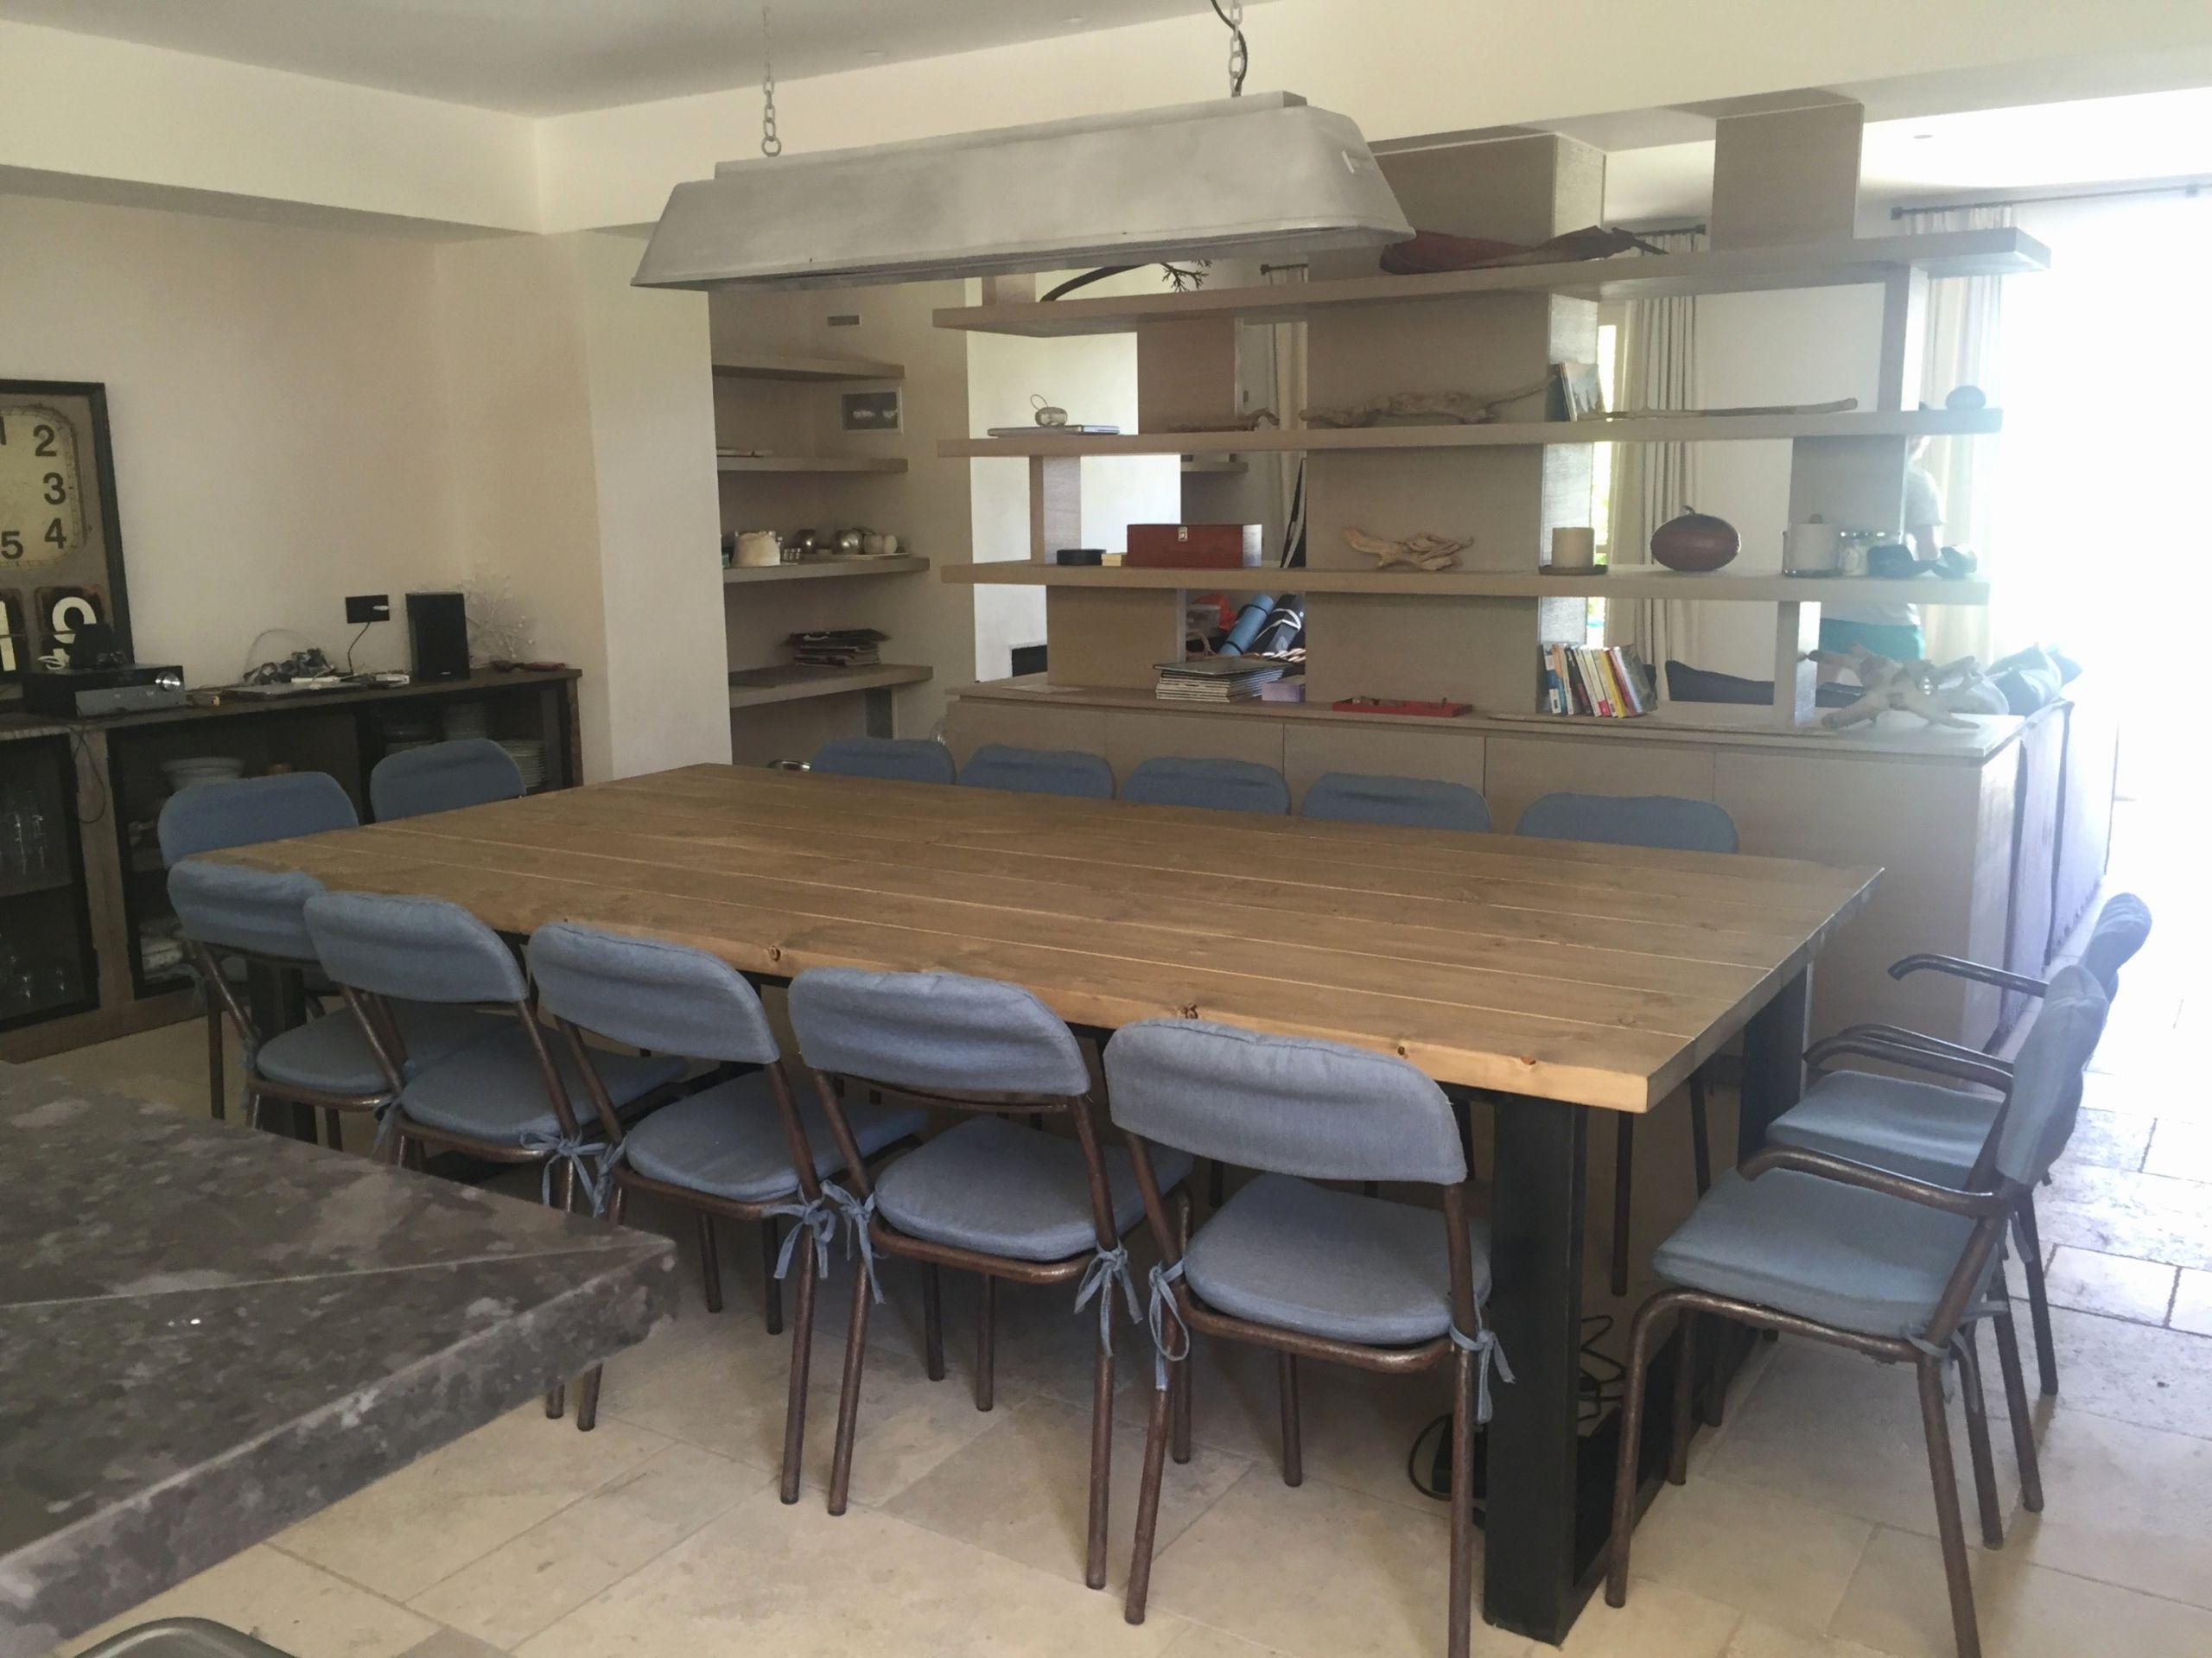 Chaises Alinea Salle A Manger 35 luxe chaise table haute | salon jardin